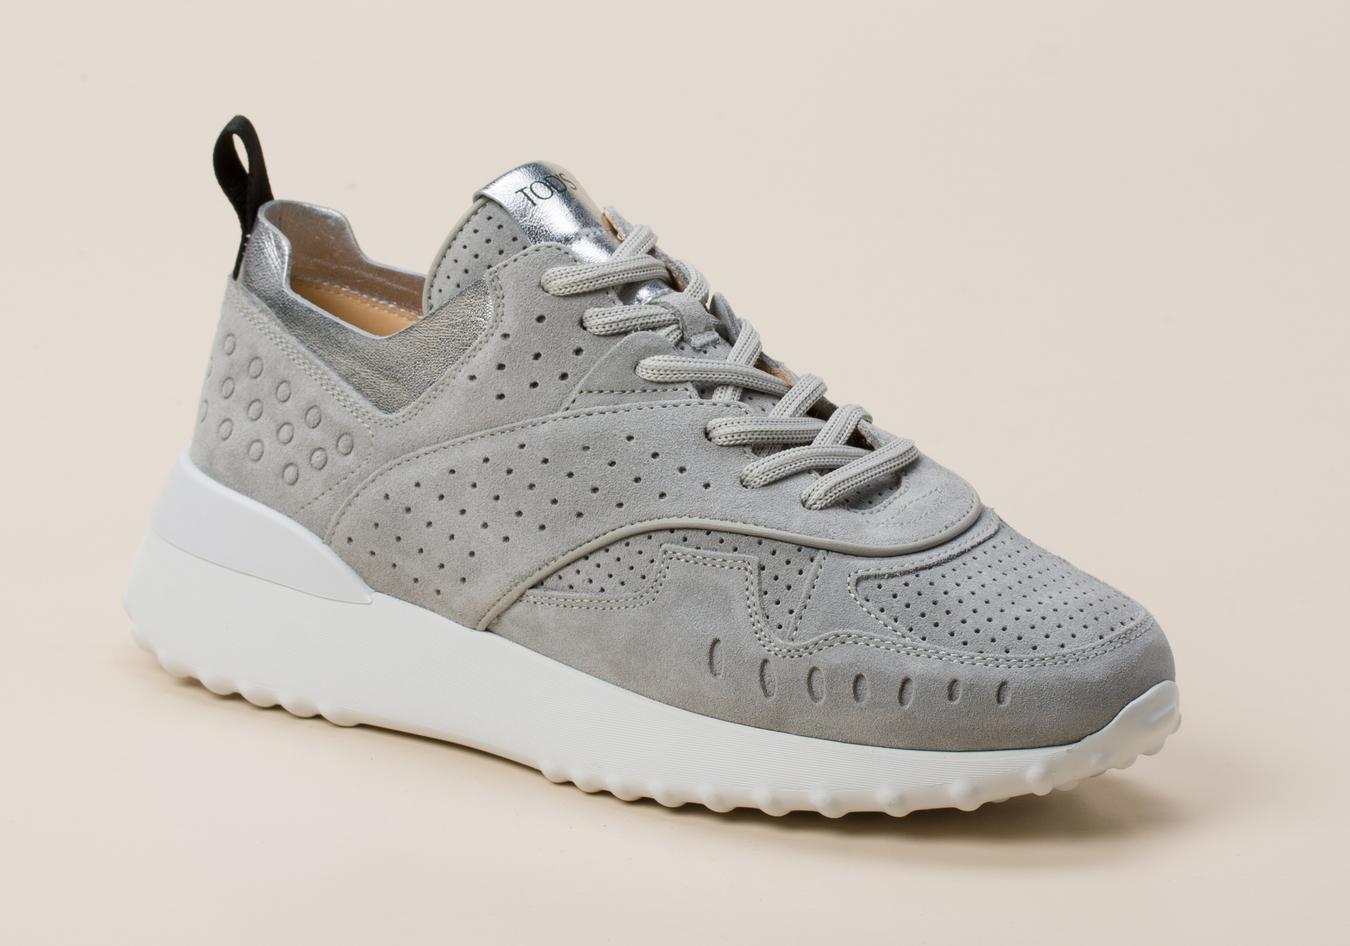 Damen Grau In Shop Tod's Sneaker Online KaufenZumnorde MUVGSqzp